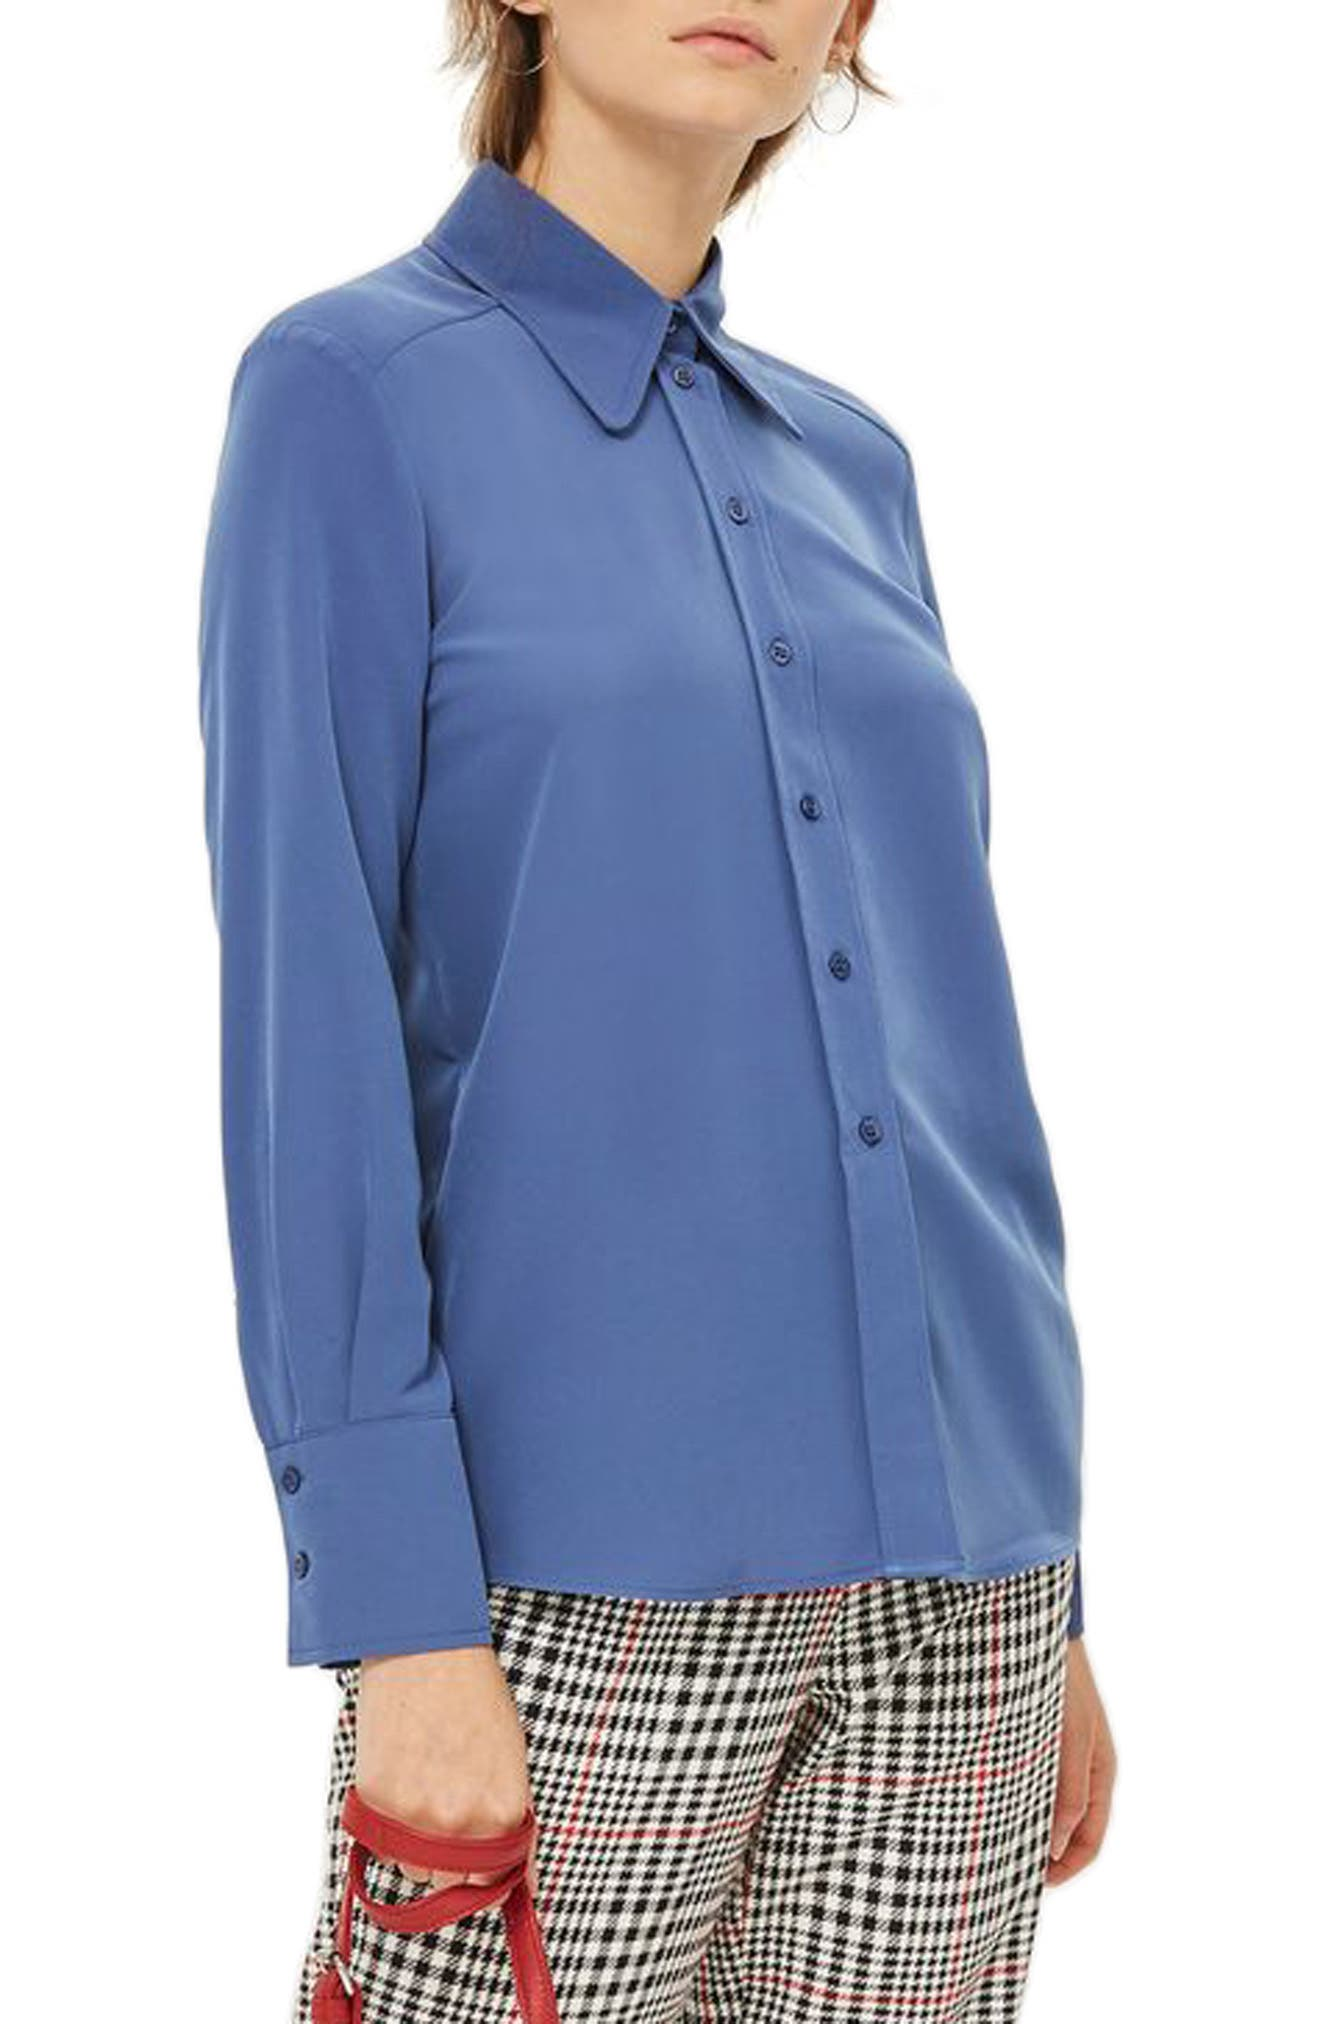 '70s Collar Shirt,                             Main thumbnail 1, color,                             400